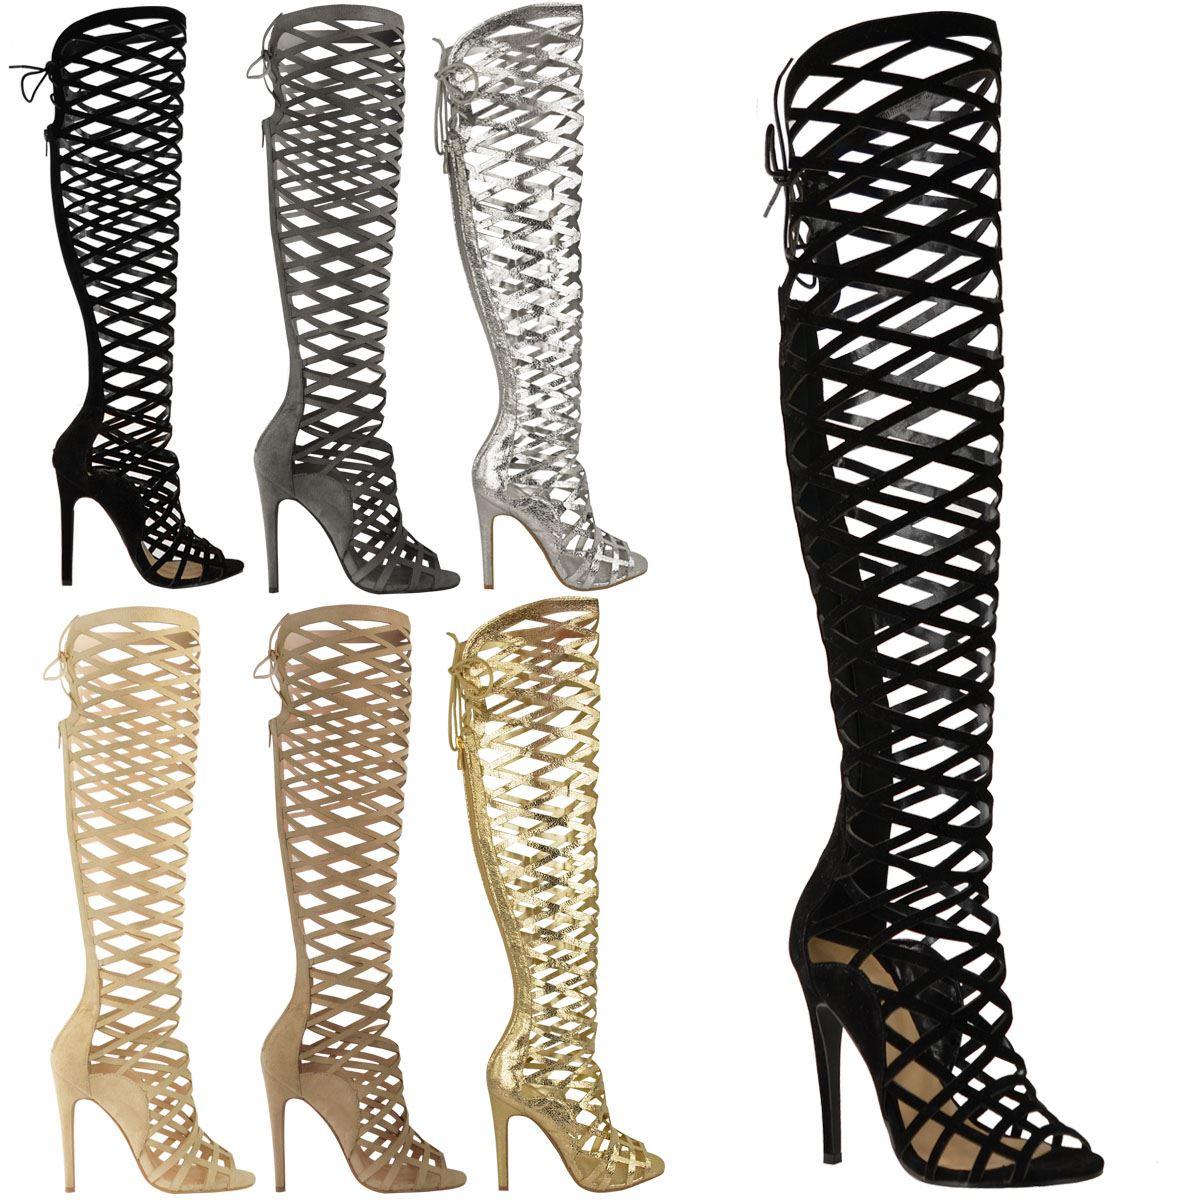 Gladiator High Heel Boots